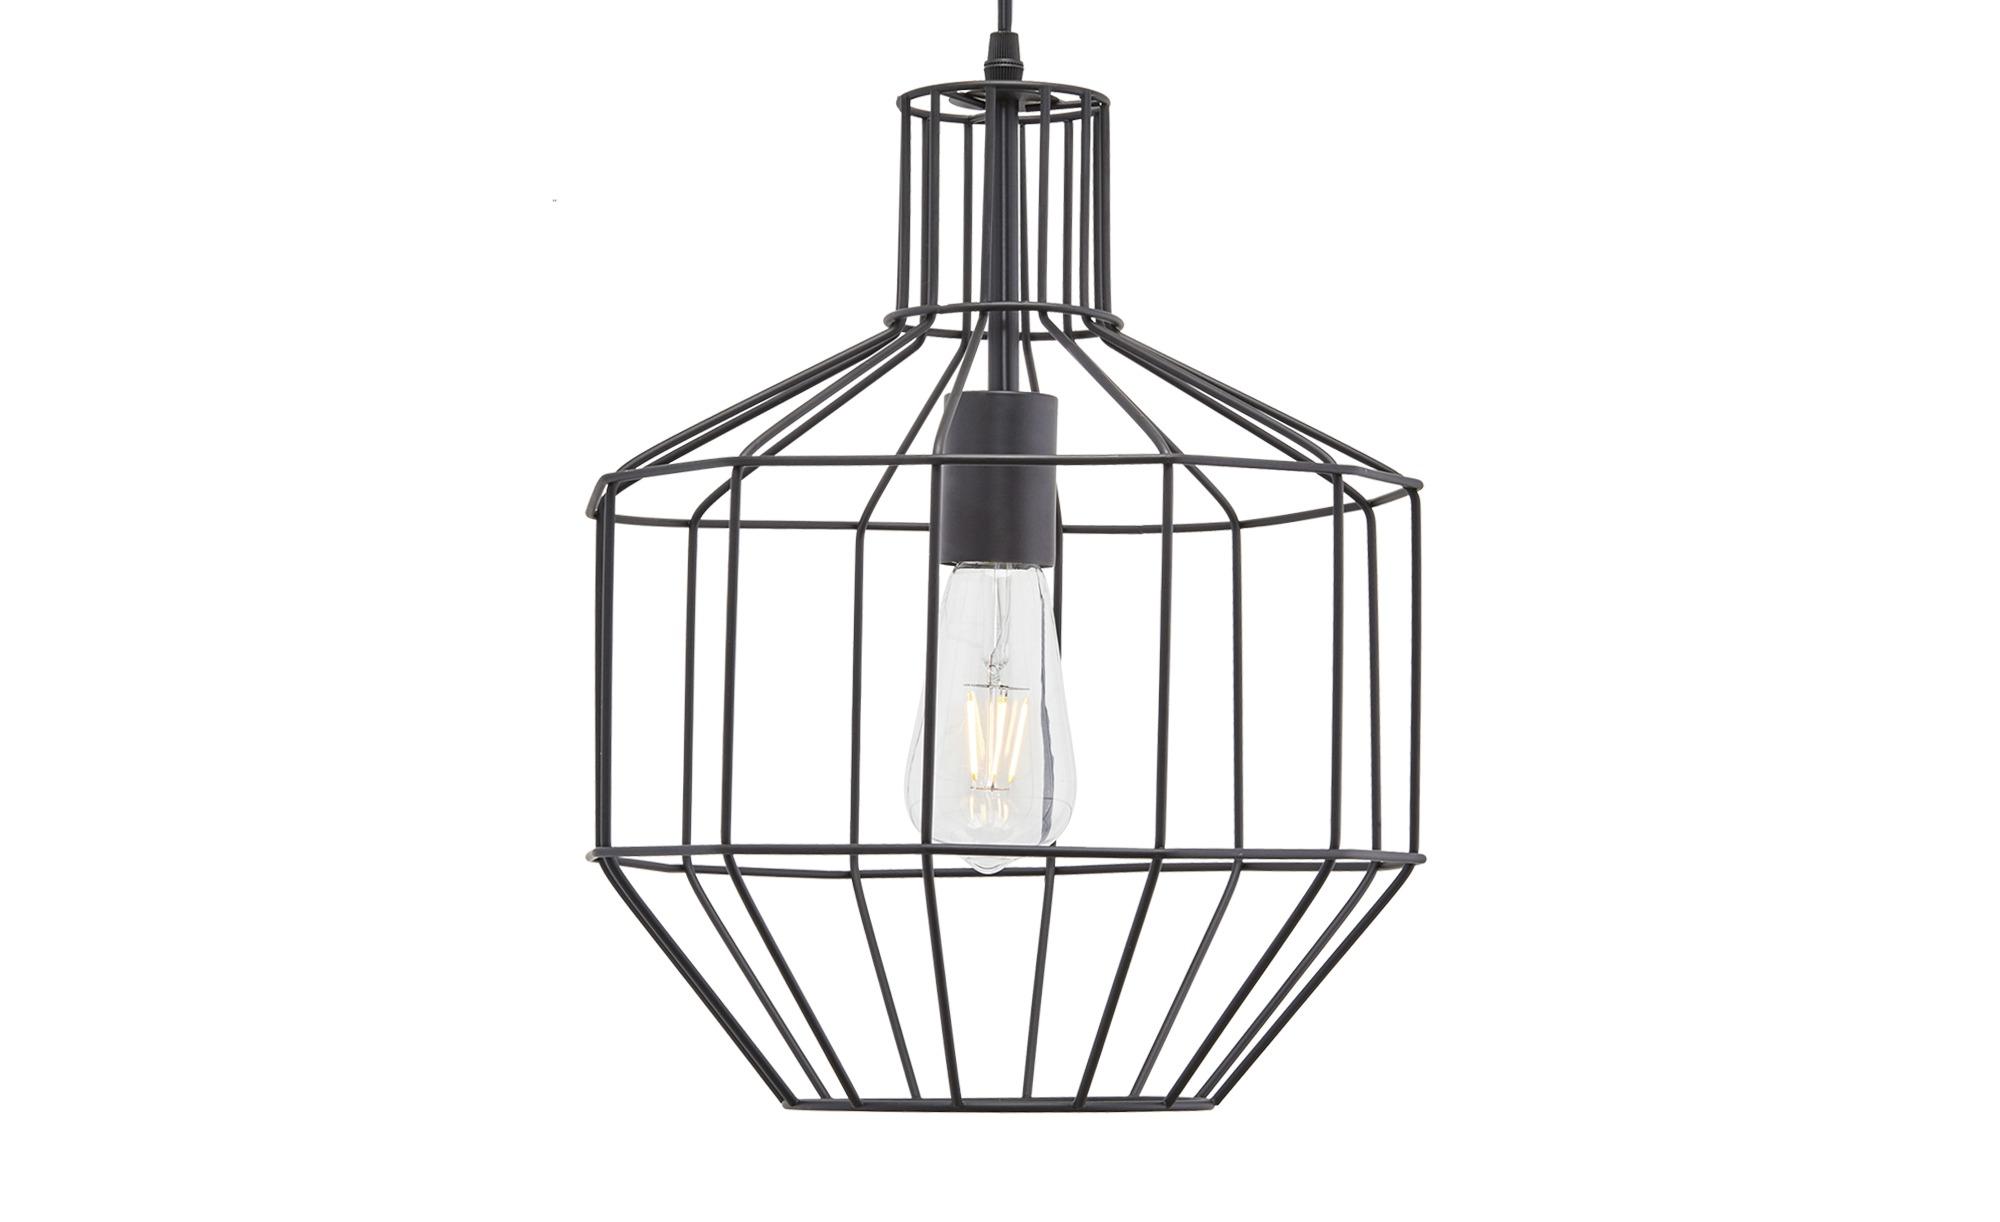 HOME STORY Pendelleuchte ¦ schwarz ¦ Maße (cm): H: 150 Ø: 29.5 Lampen & Leuchten > Innenleuchten > Pendelleuchten - Höffner